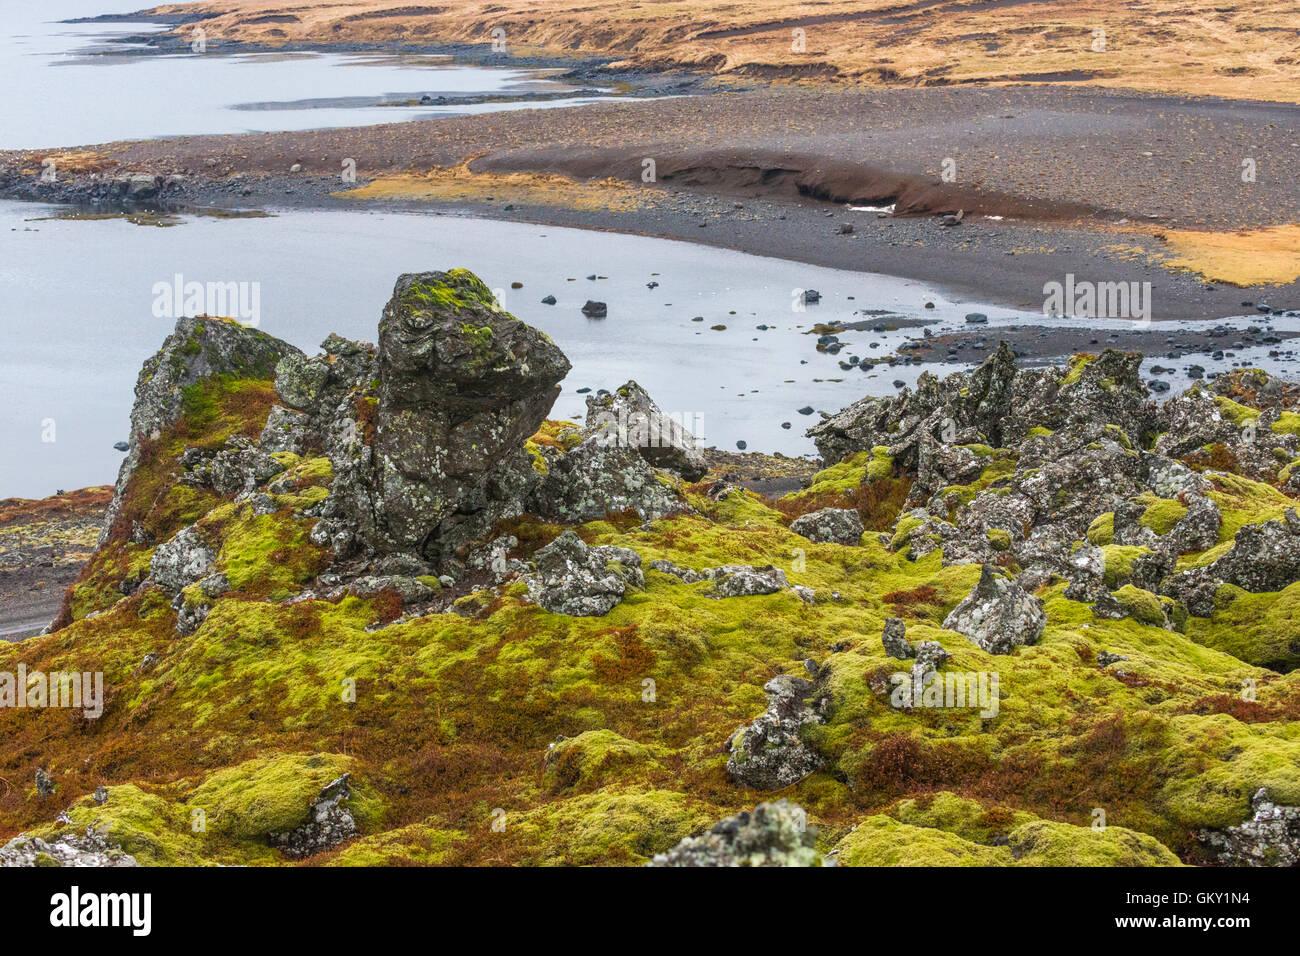 The Berserkjahraun lava field meets the Hraunsfjörður fjord on the Snaefellsnes peninsula in western Iceland. - Stock Image